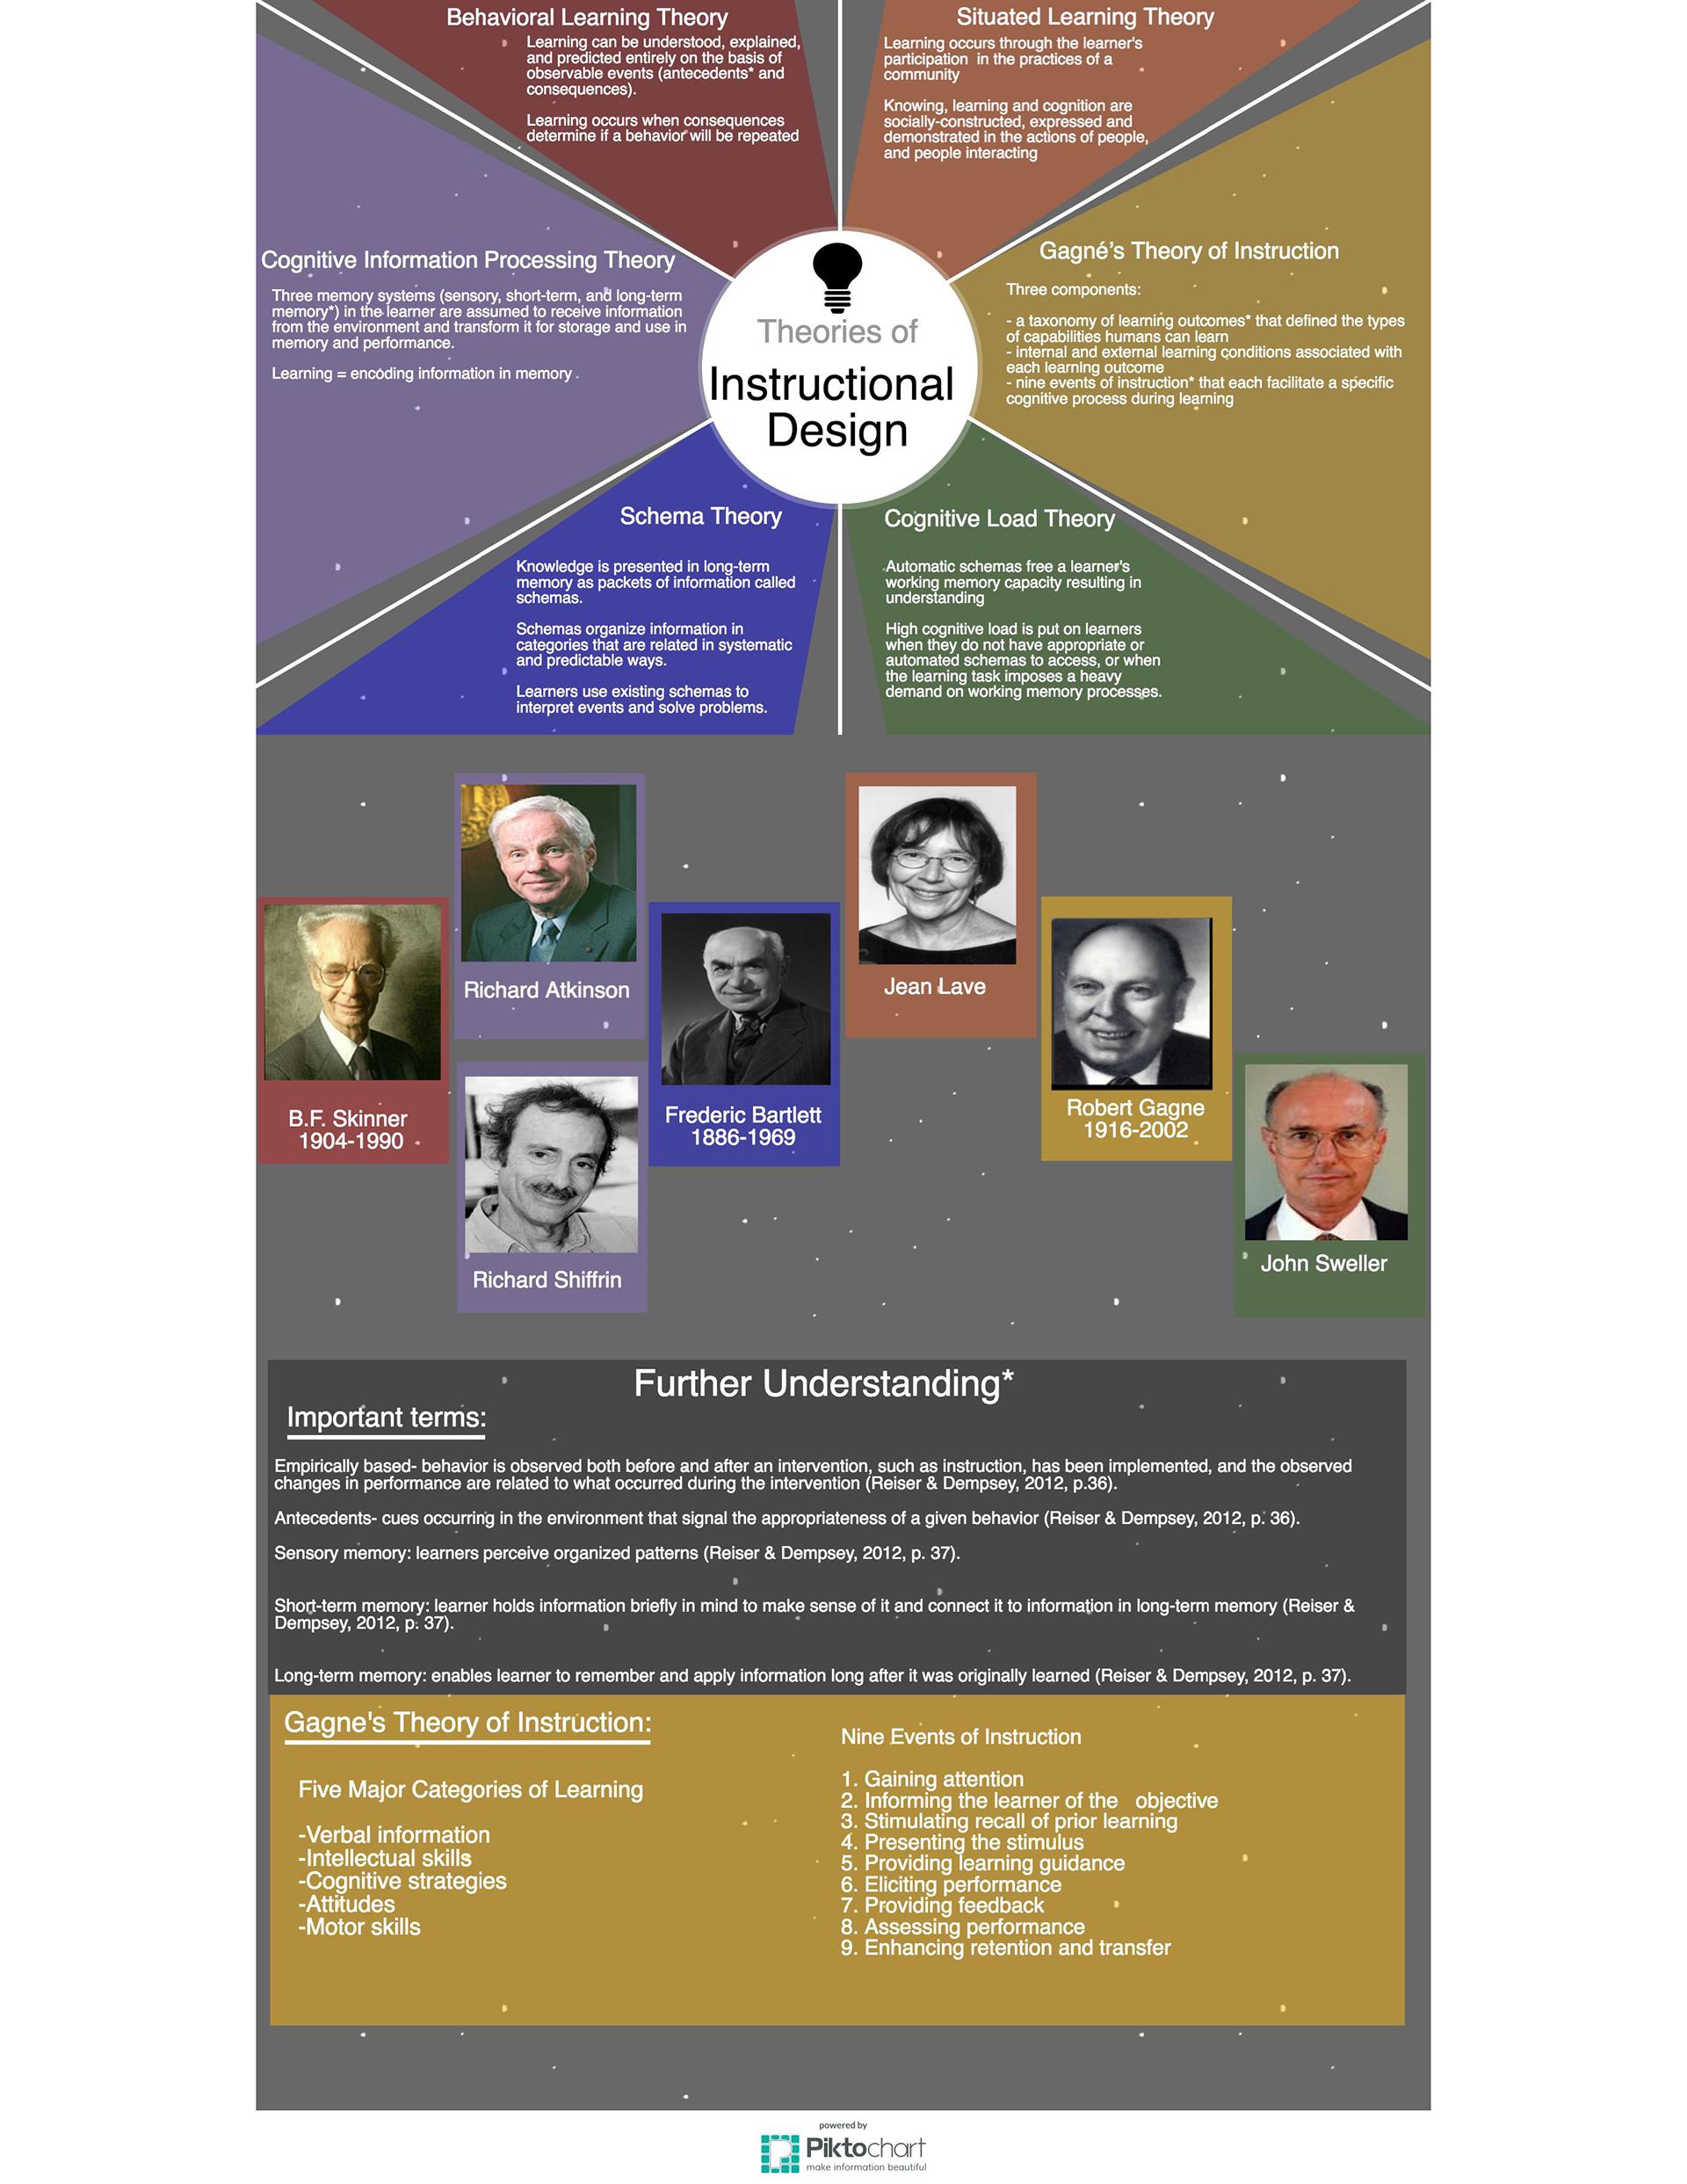 Allison Moxam Theories Of Instructional Design Infographic